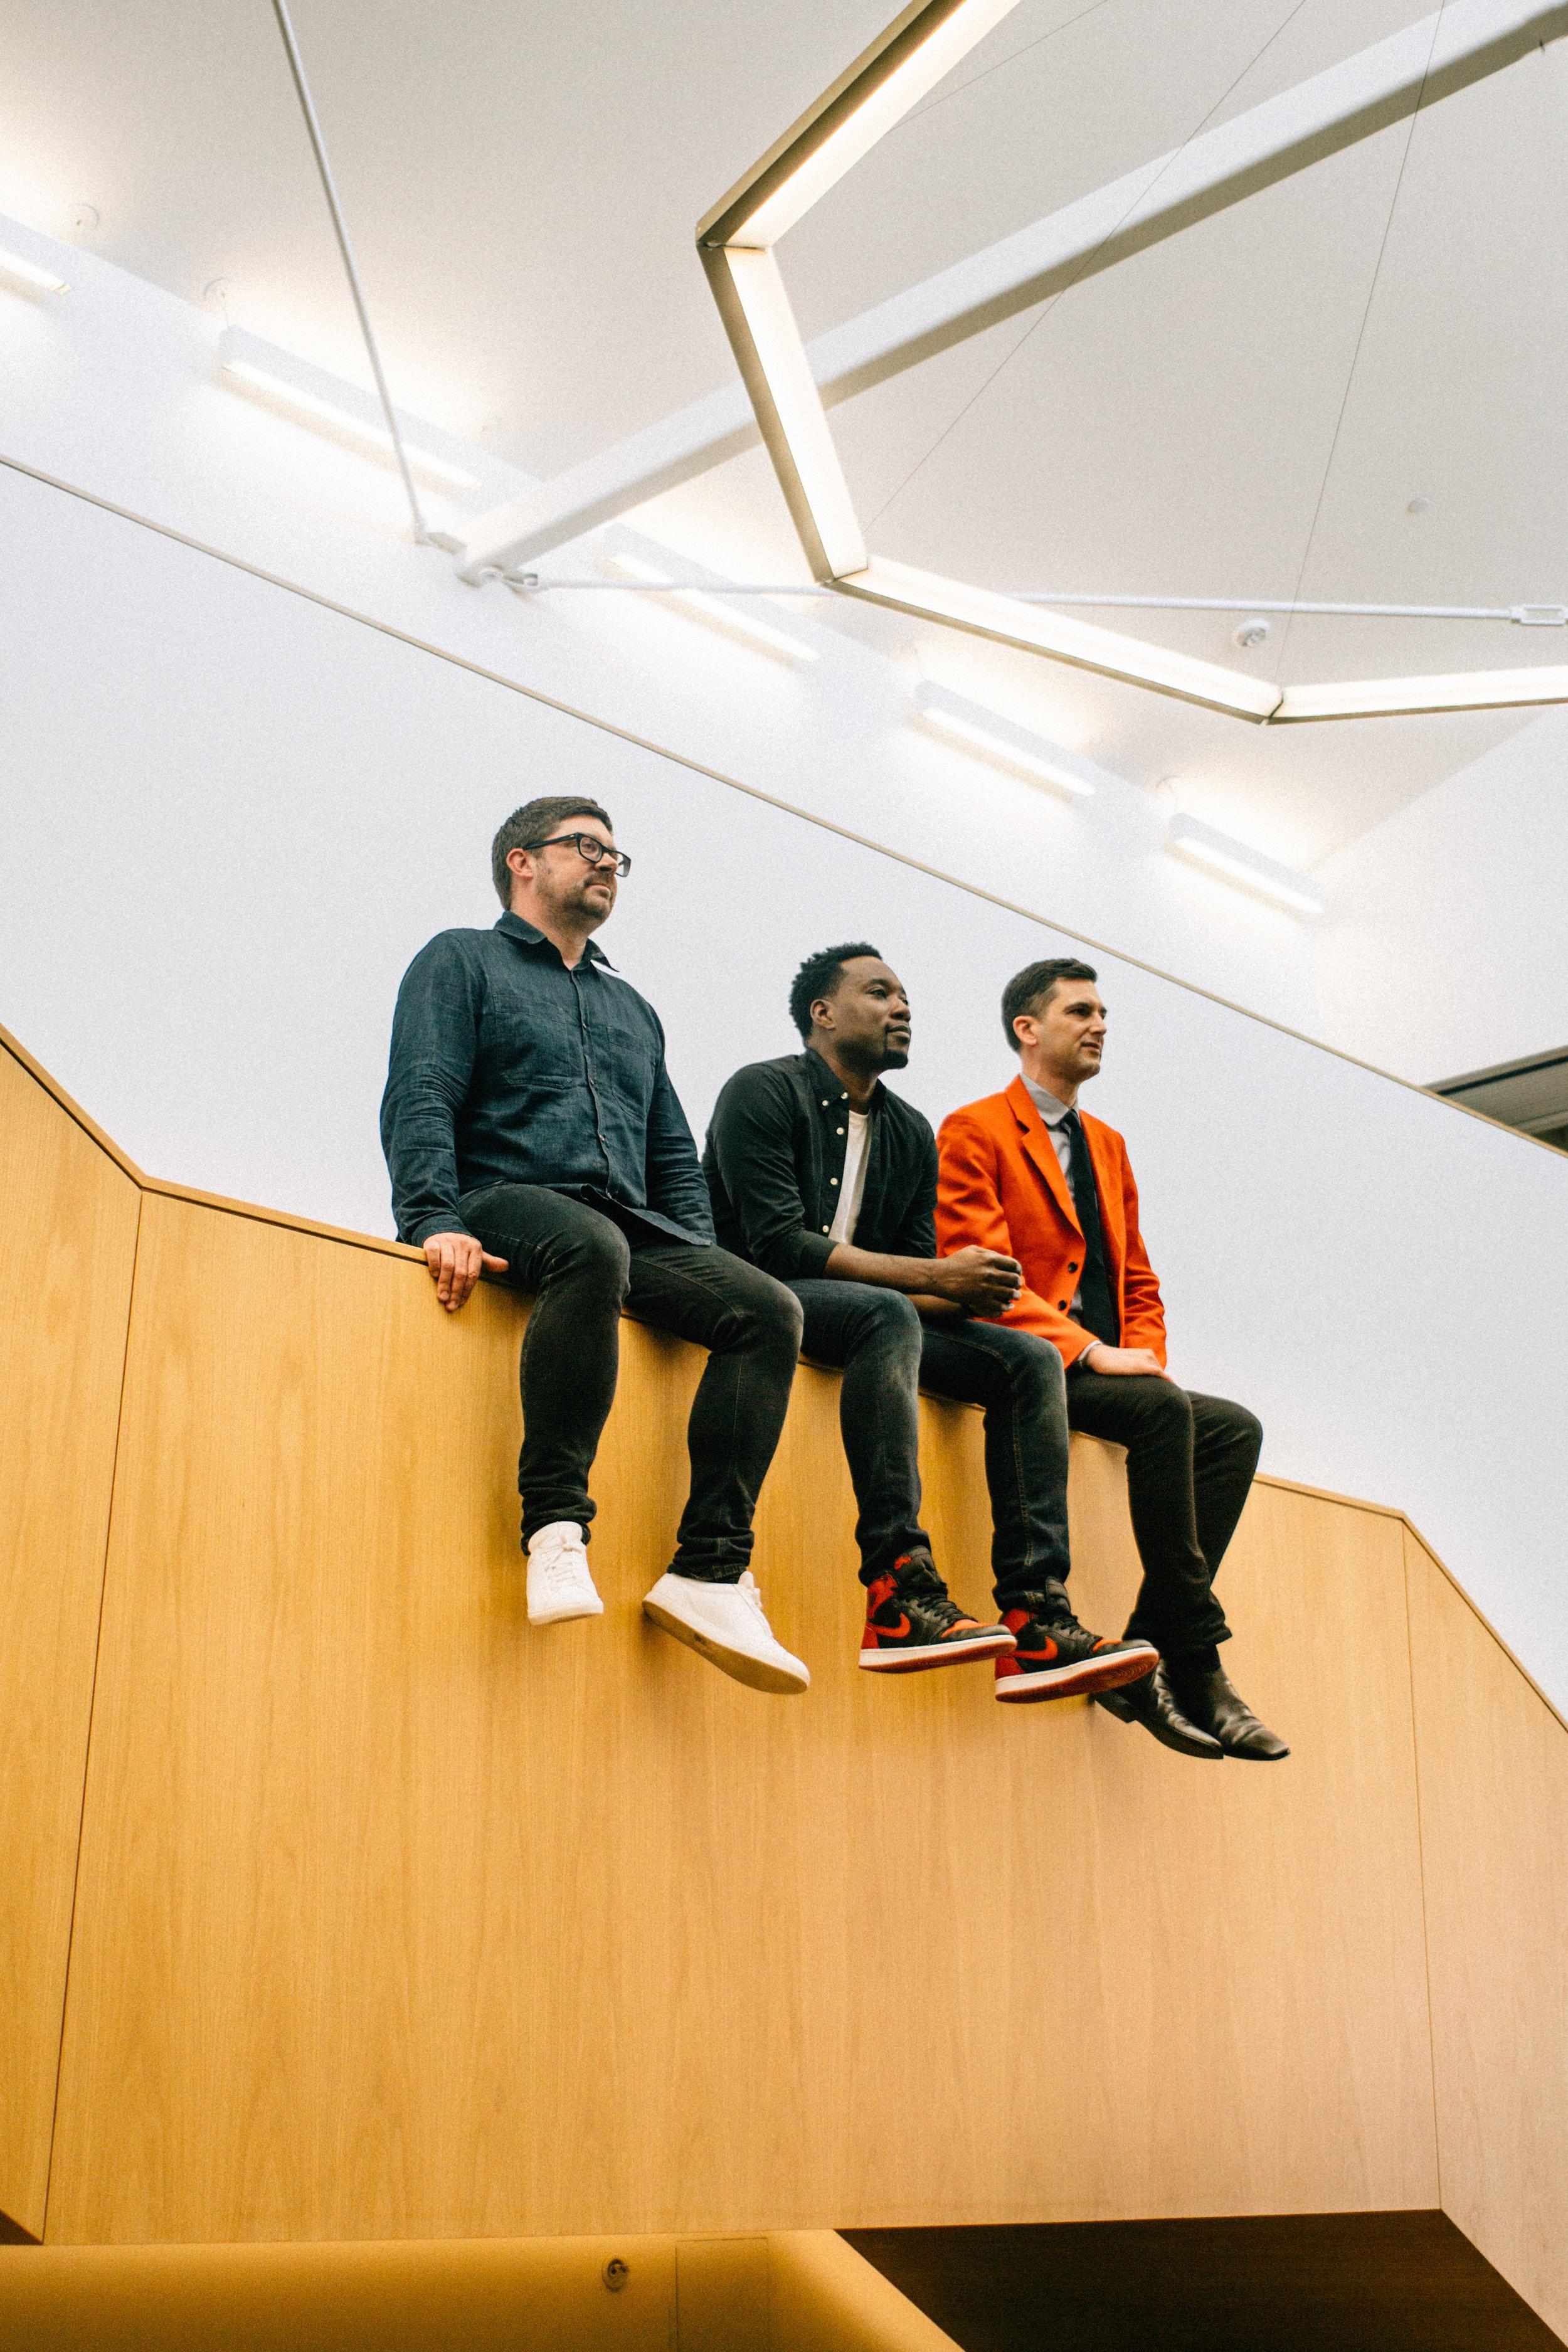 BuzzFeed editorial on Beats by Dre in Los Angeles California by Joel Bear